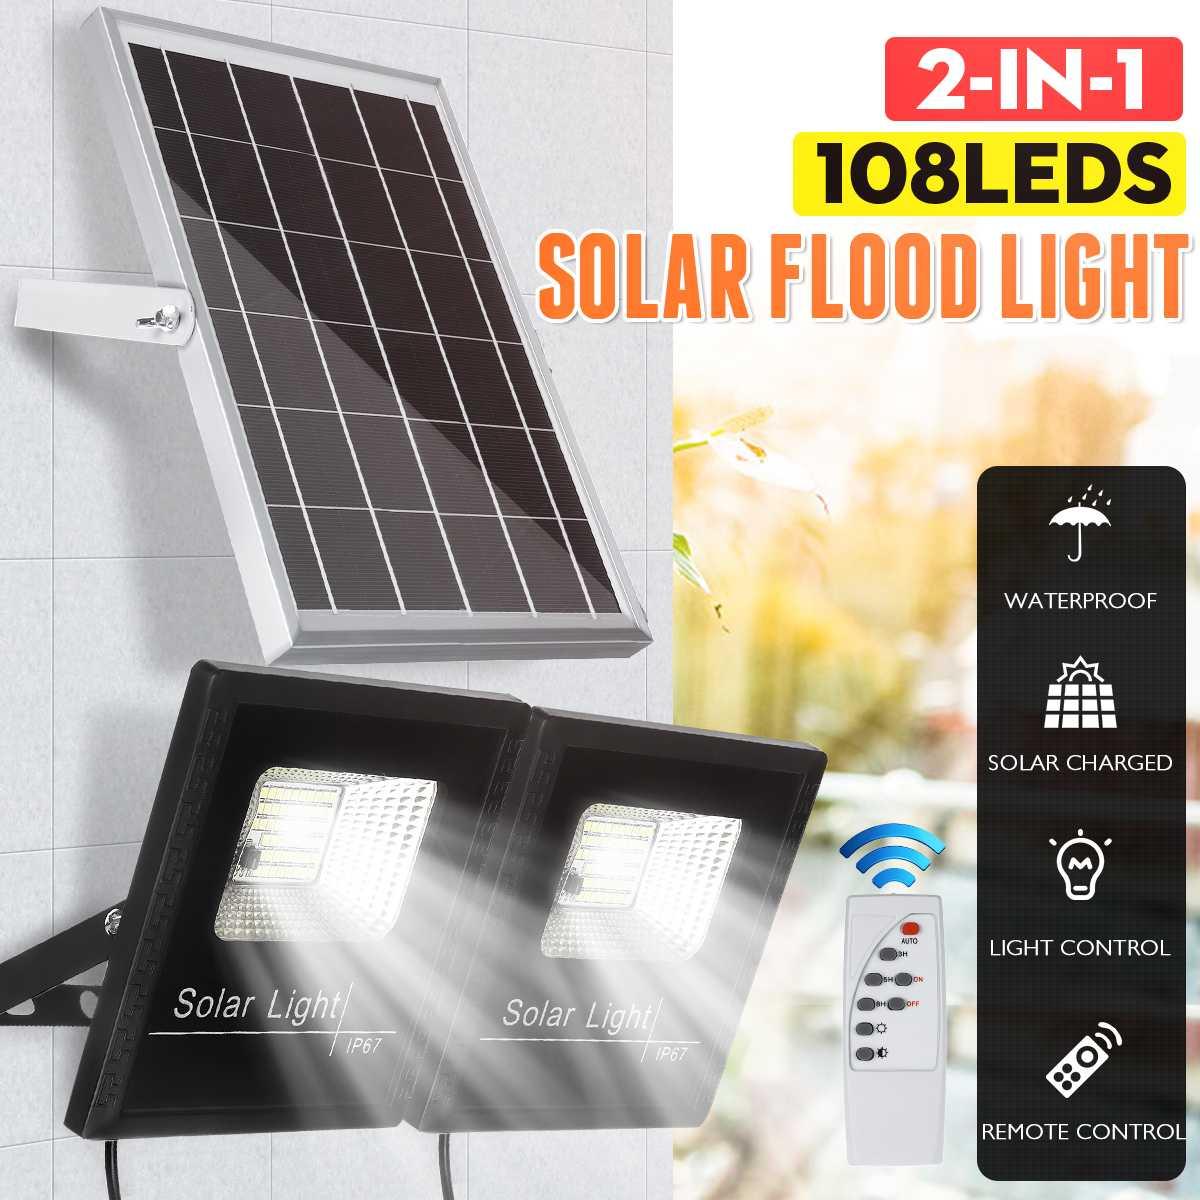 500W LED Solar Flood Light Remote Control Spotlight IP67 Waterproof Street Light Dimmable Outdoor Garden Lamp Timer Function